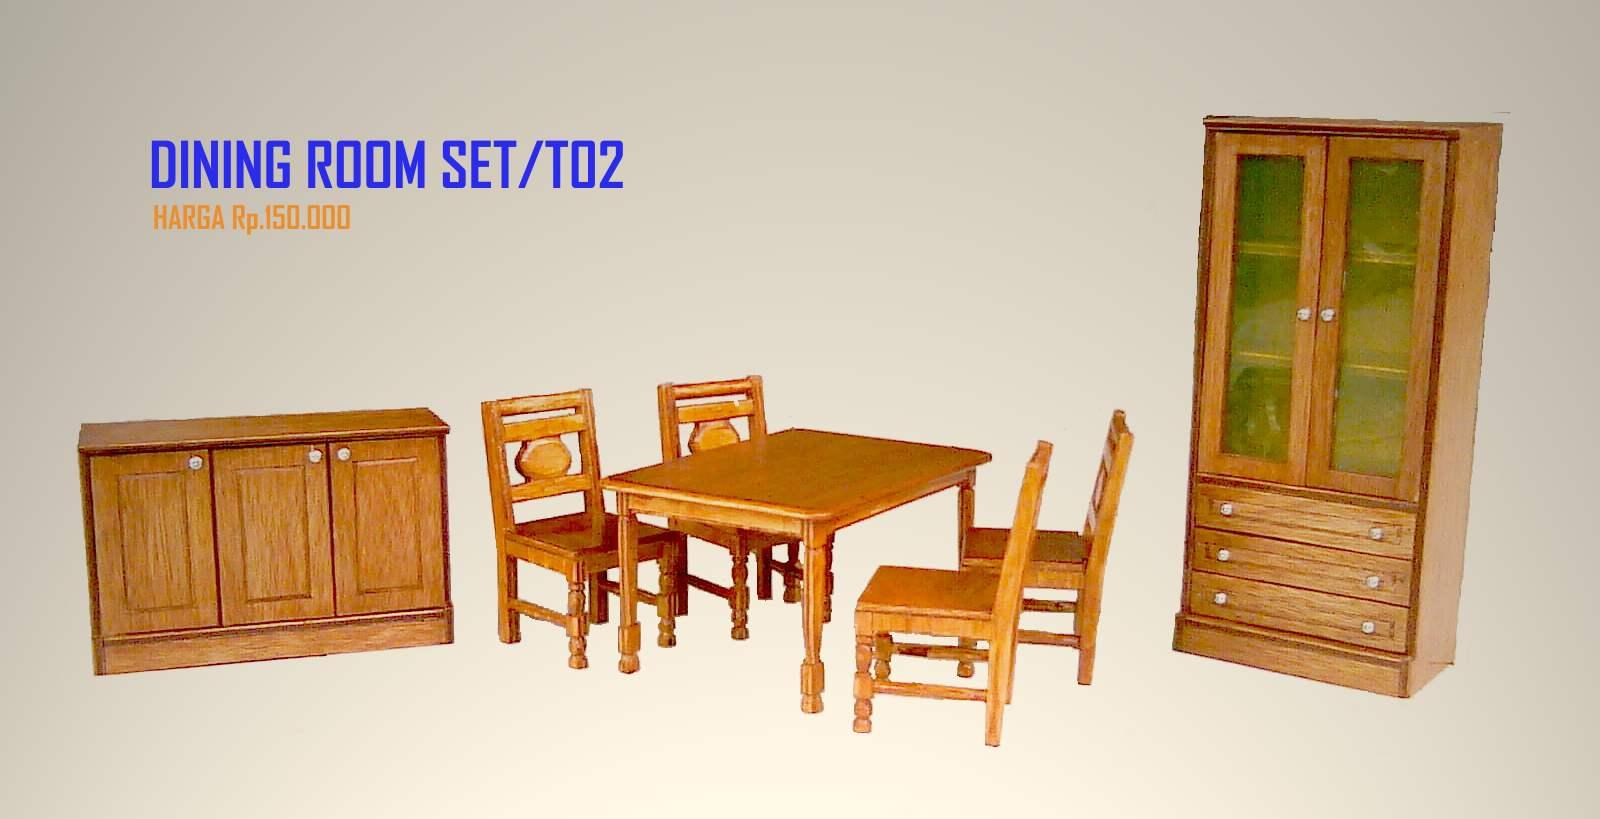 BARBIE Furniture Collection BARBIE dining set room : DNR02 from barbiefurniturecollection.blogspot.com size 1600 x 819 jpeg 85kB